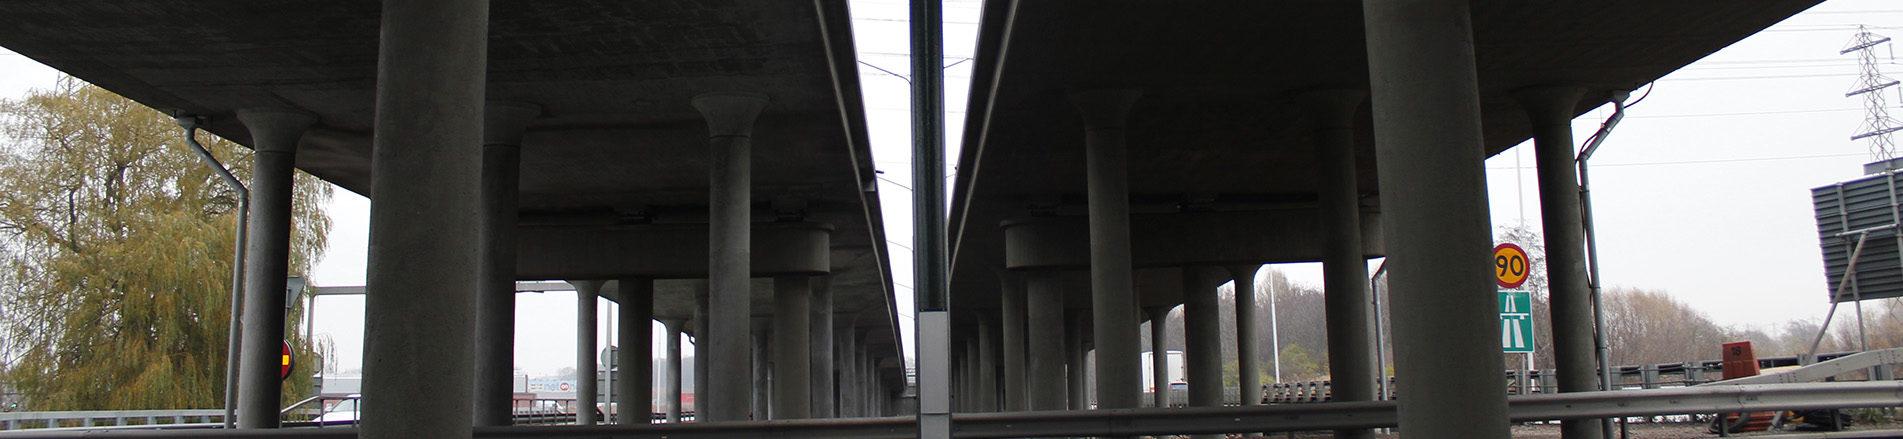 Underpinning bridge